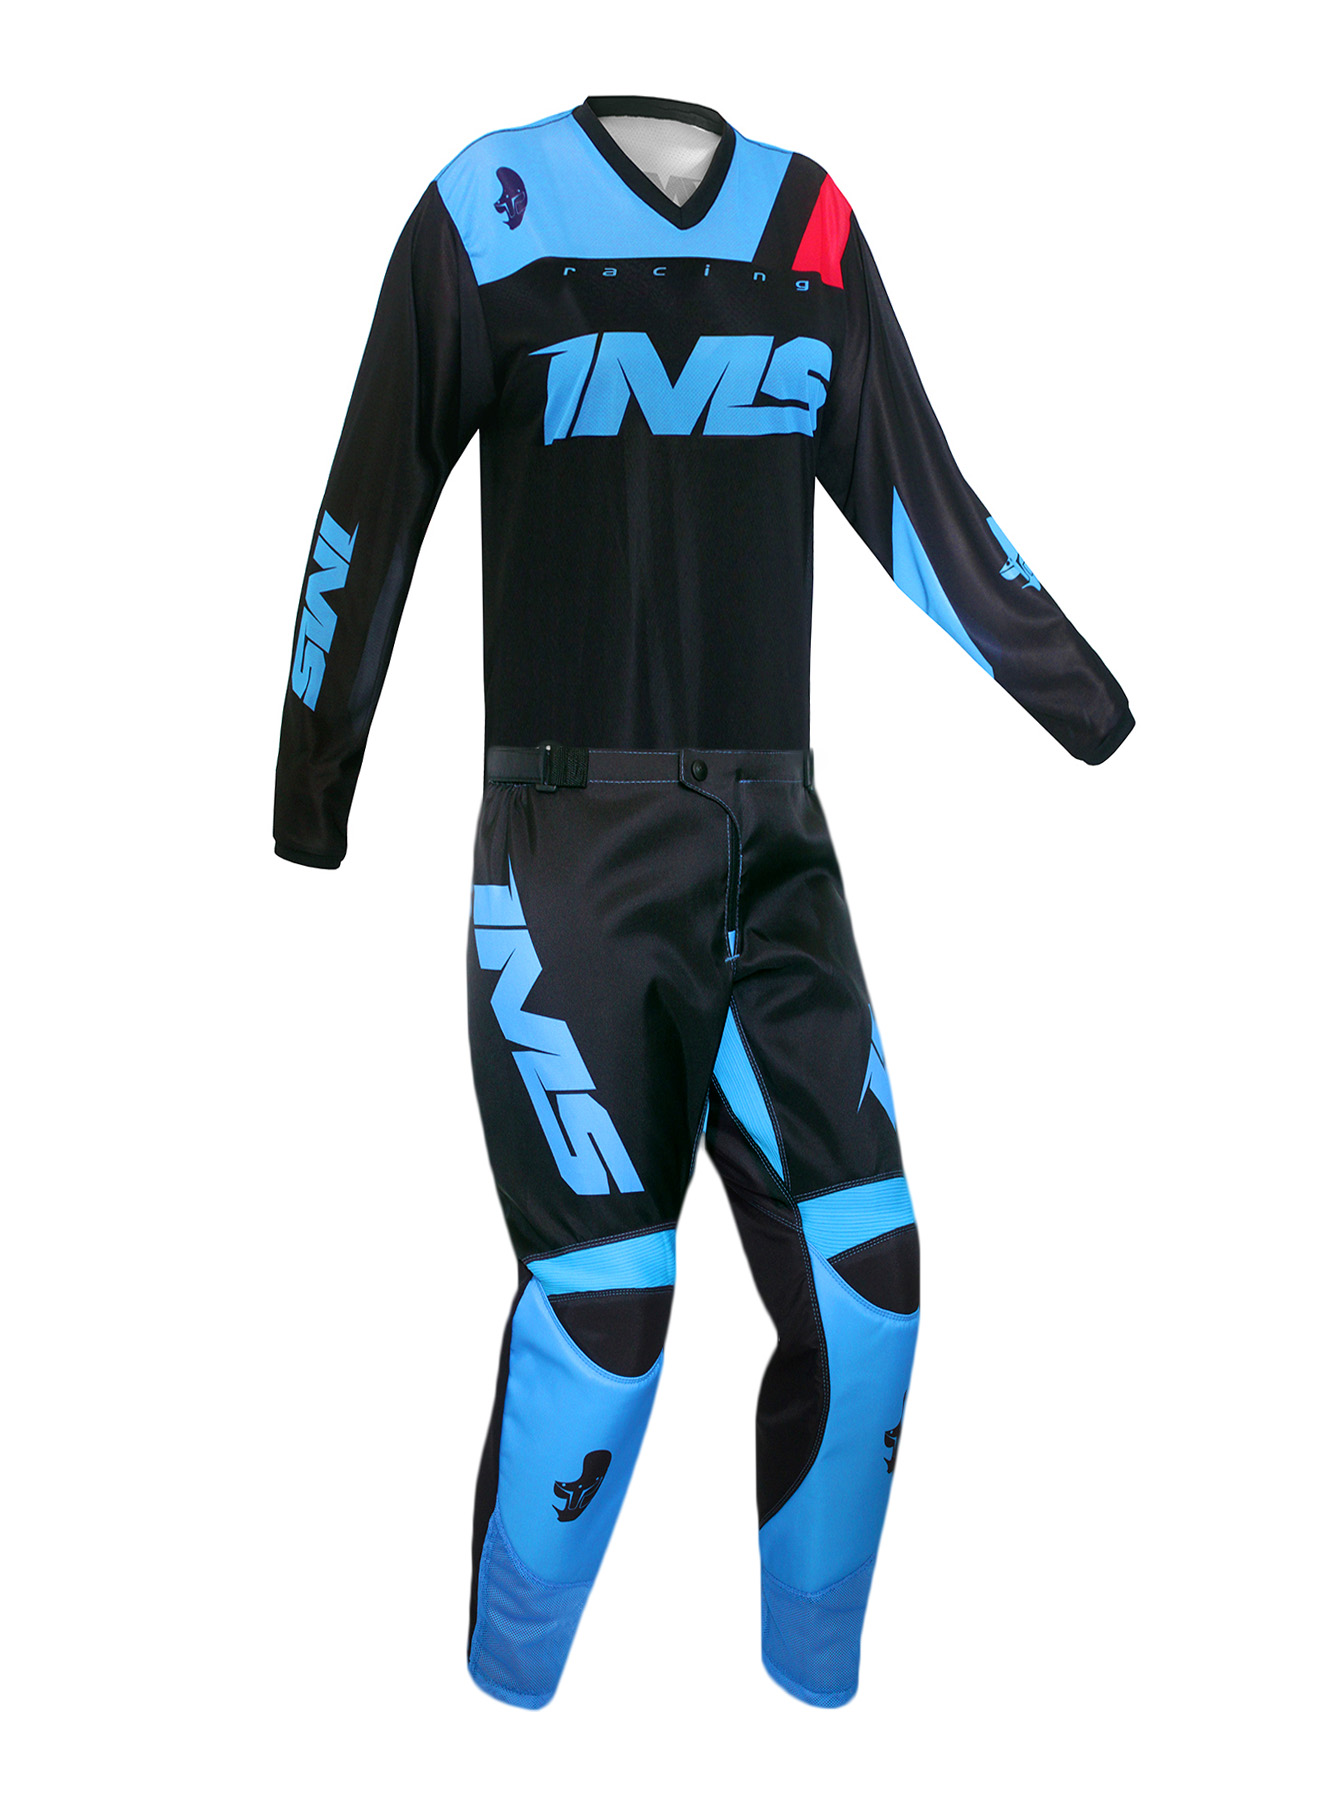 Conjunto Roupa Ims Malibu Camisa Calça Trilha Motocross